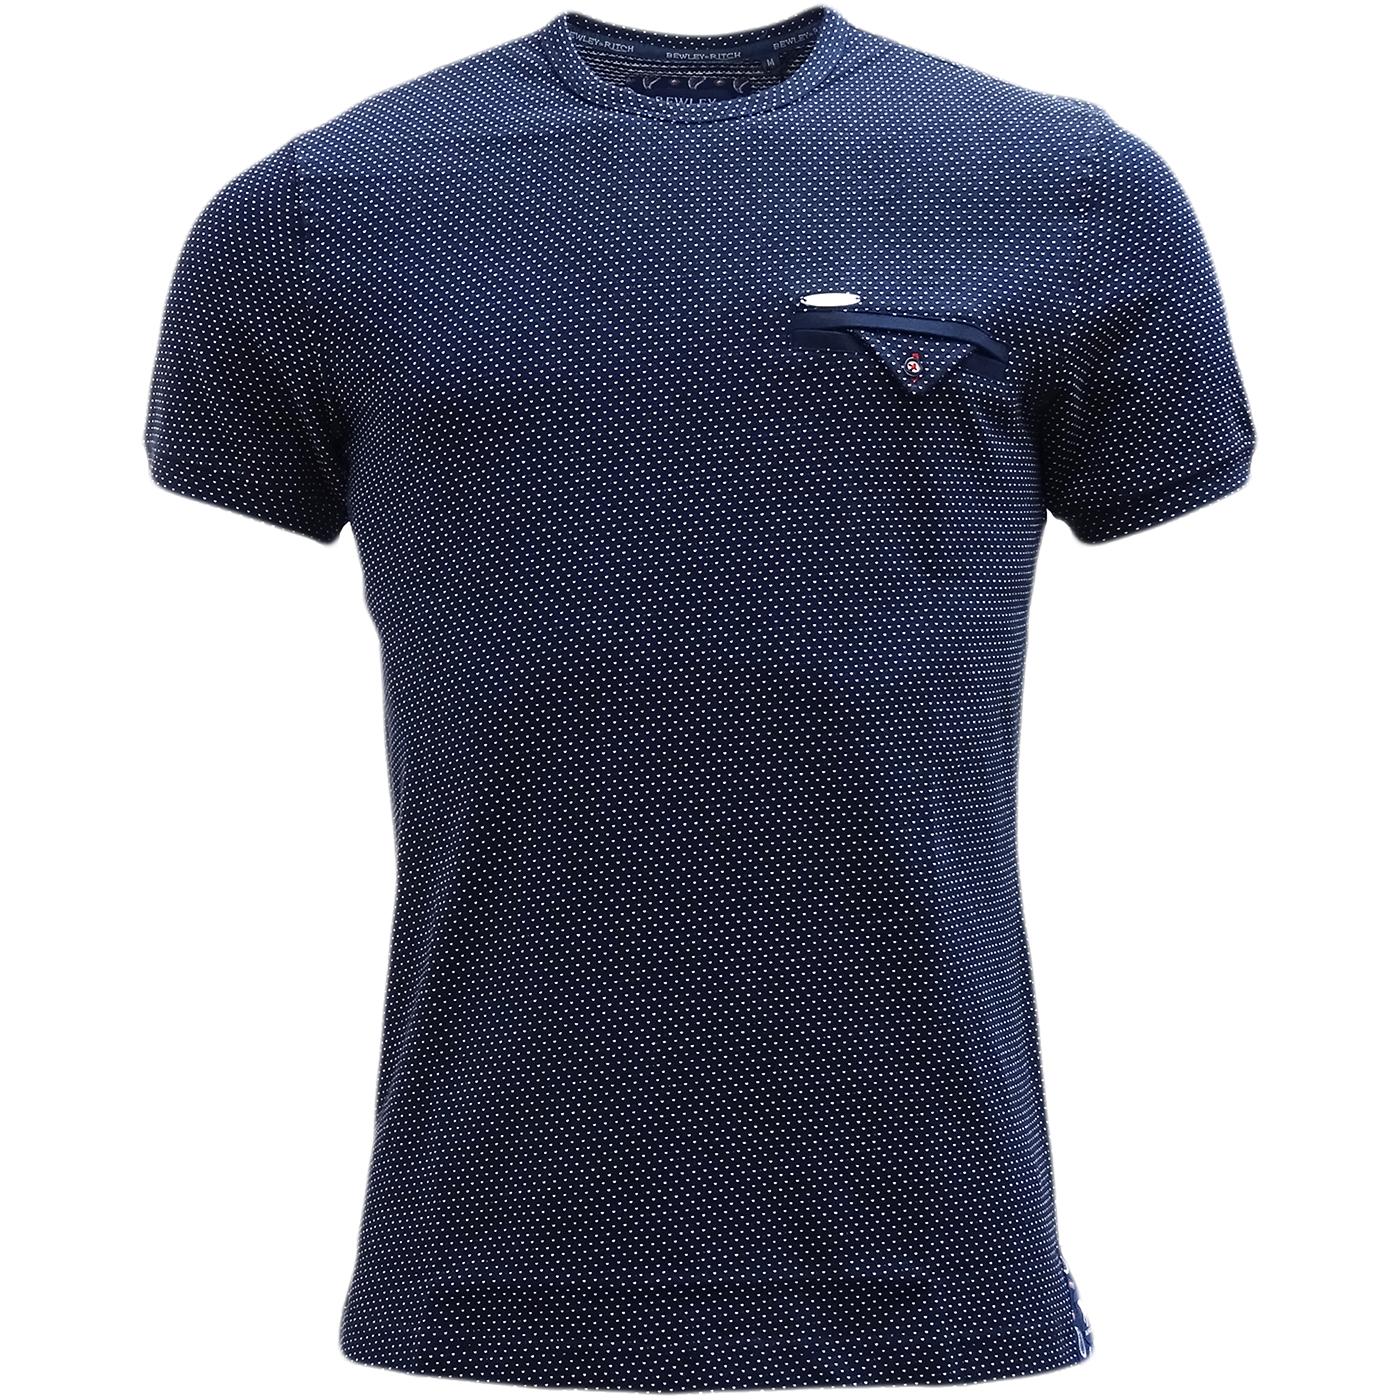 Bewley & Ritch Polka Dot T-Shirt Swain Navy